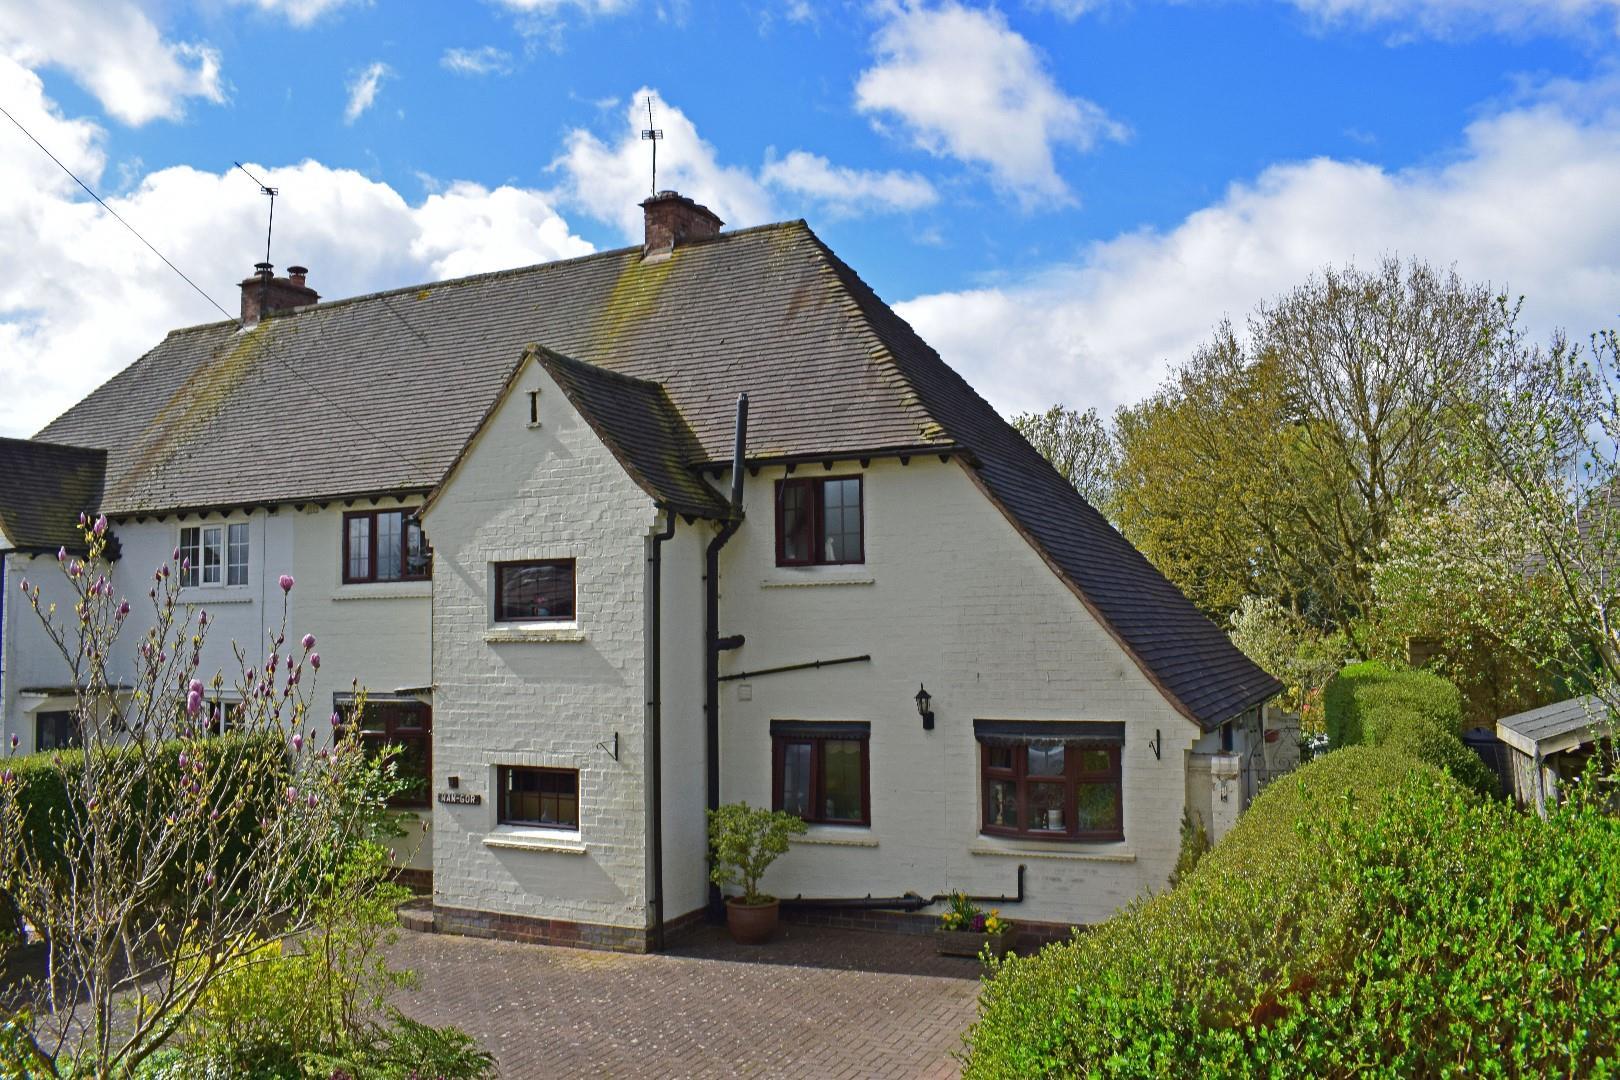 'Nan-Gor', 4 Newbourne Hill, Rowney Green, B48 7QN